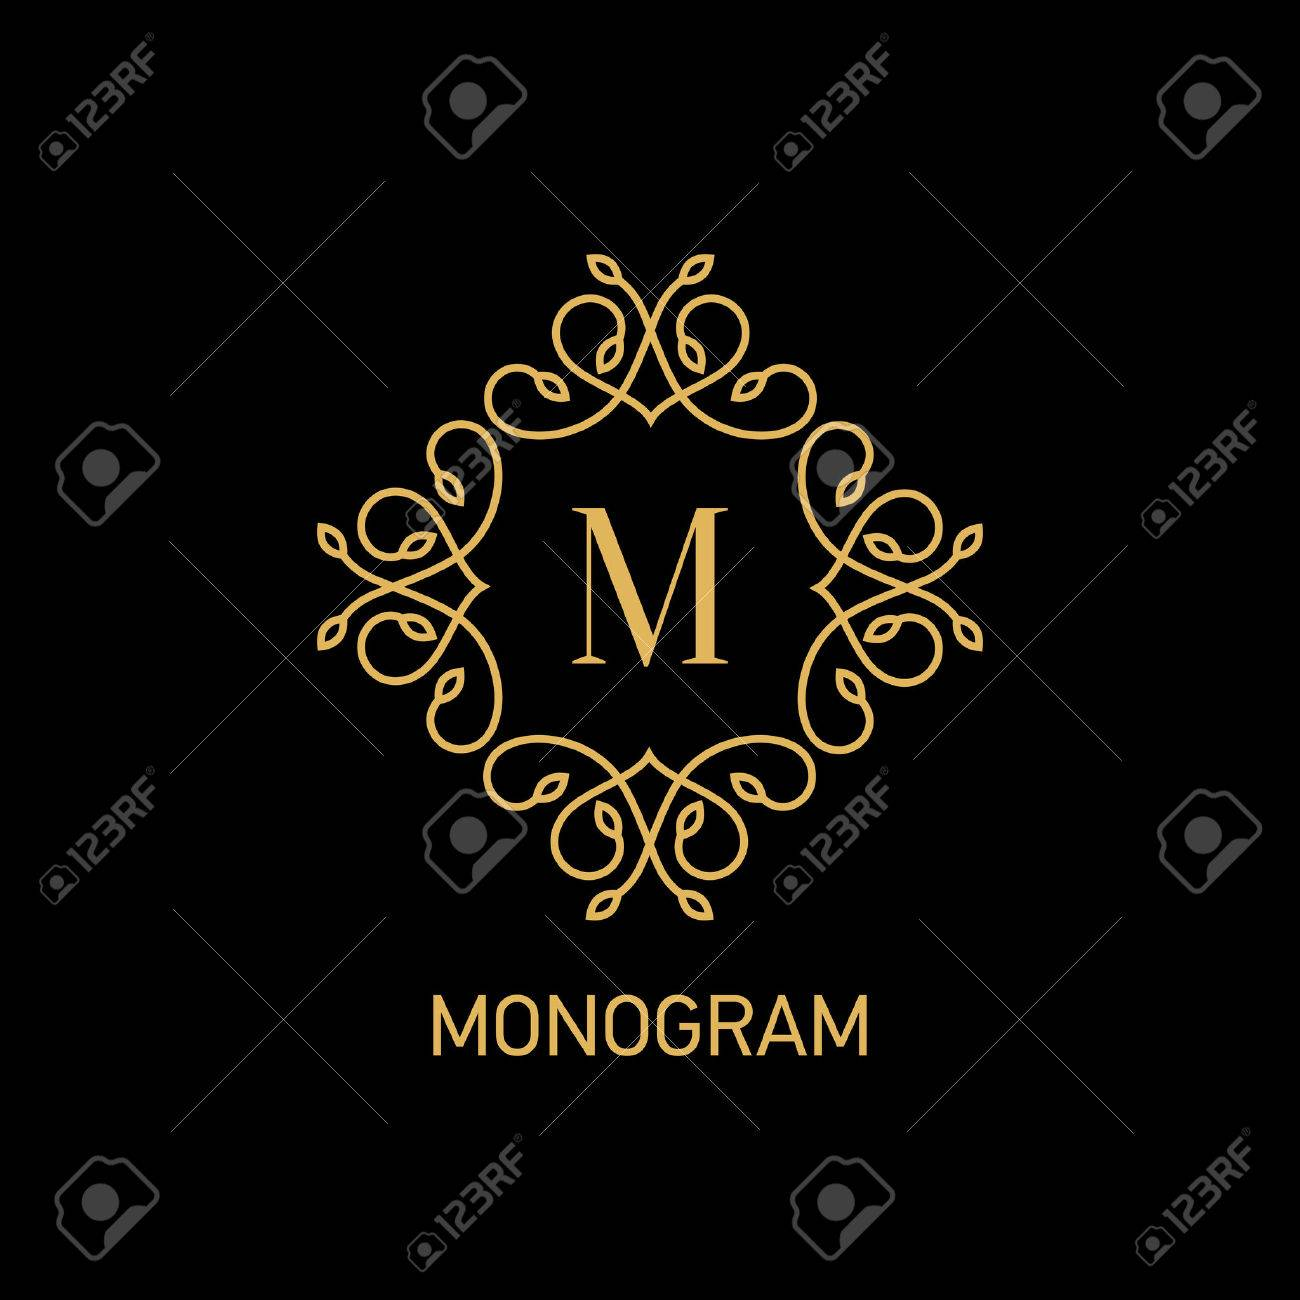 Monogram logo design. Vector illustration - 37581078